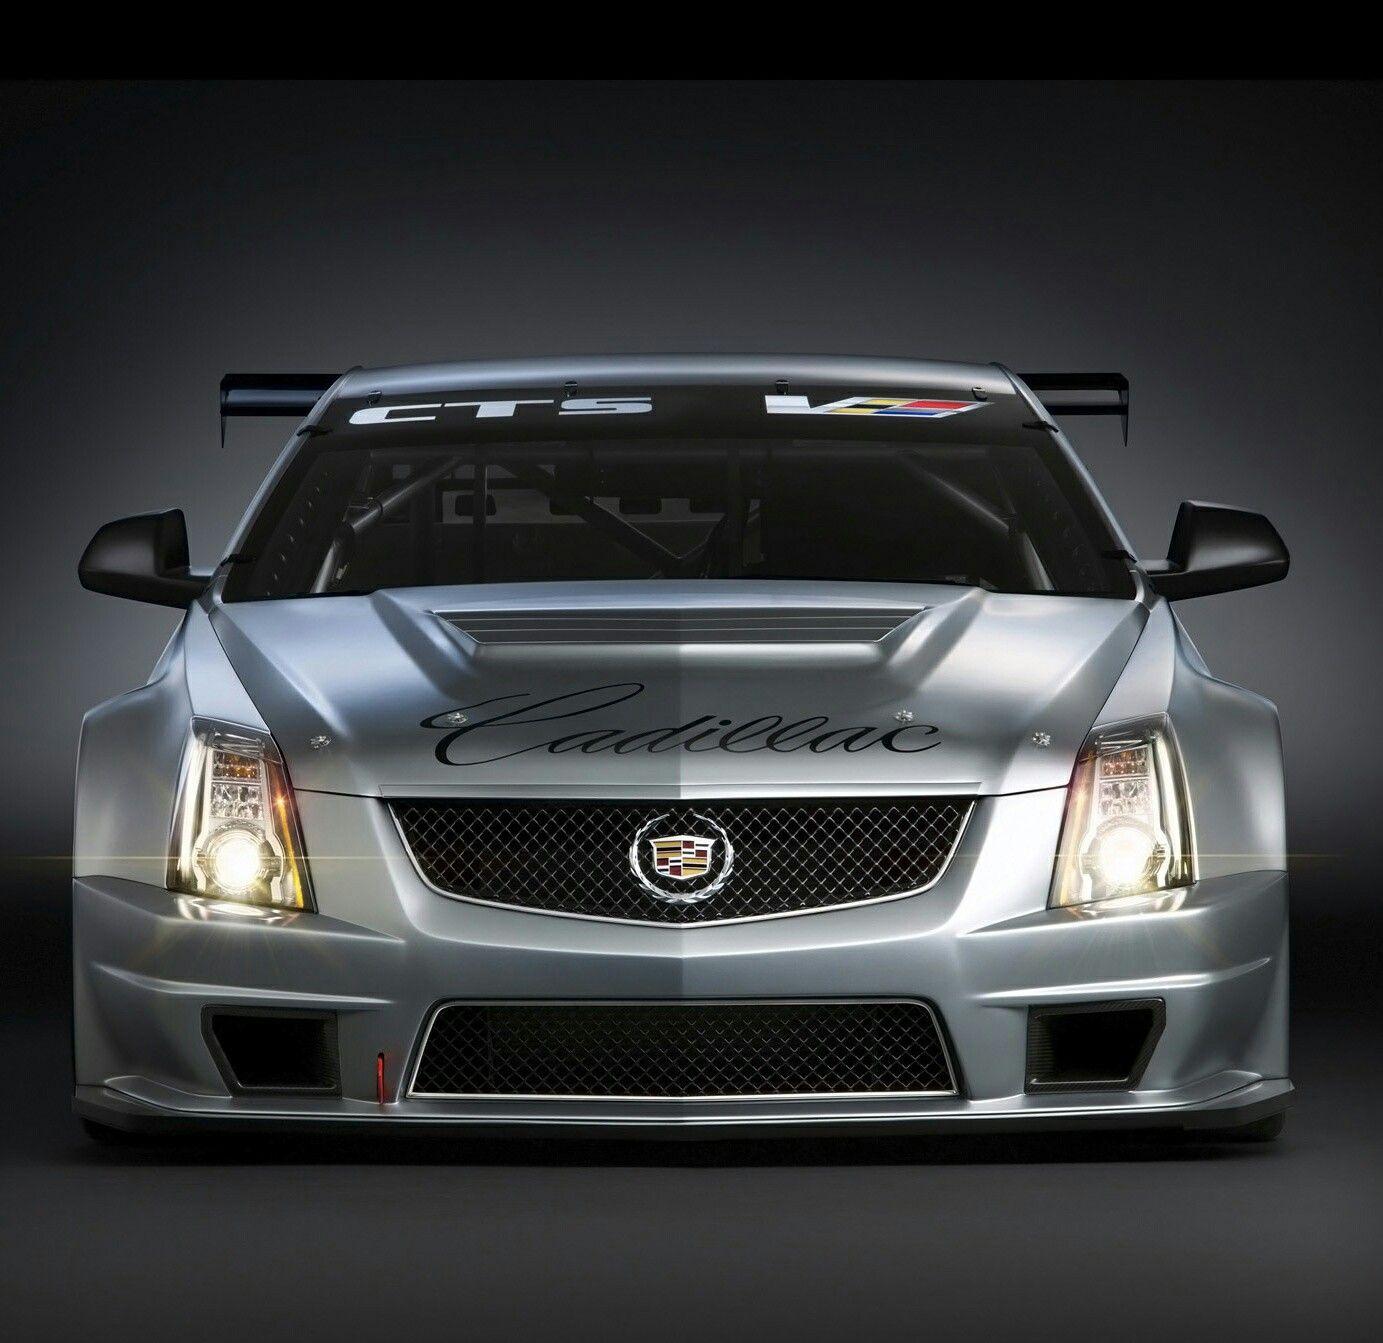 2013 Cadillac Cts V Wallpaper: Pin On Auto Aficionado (°!°